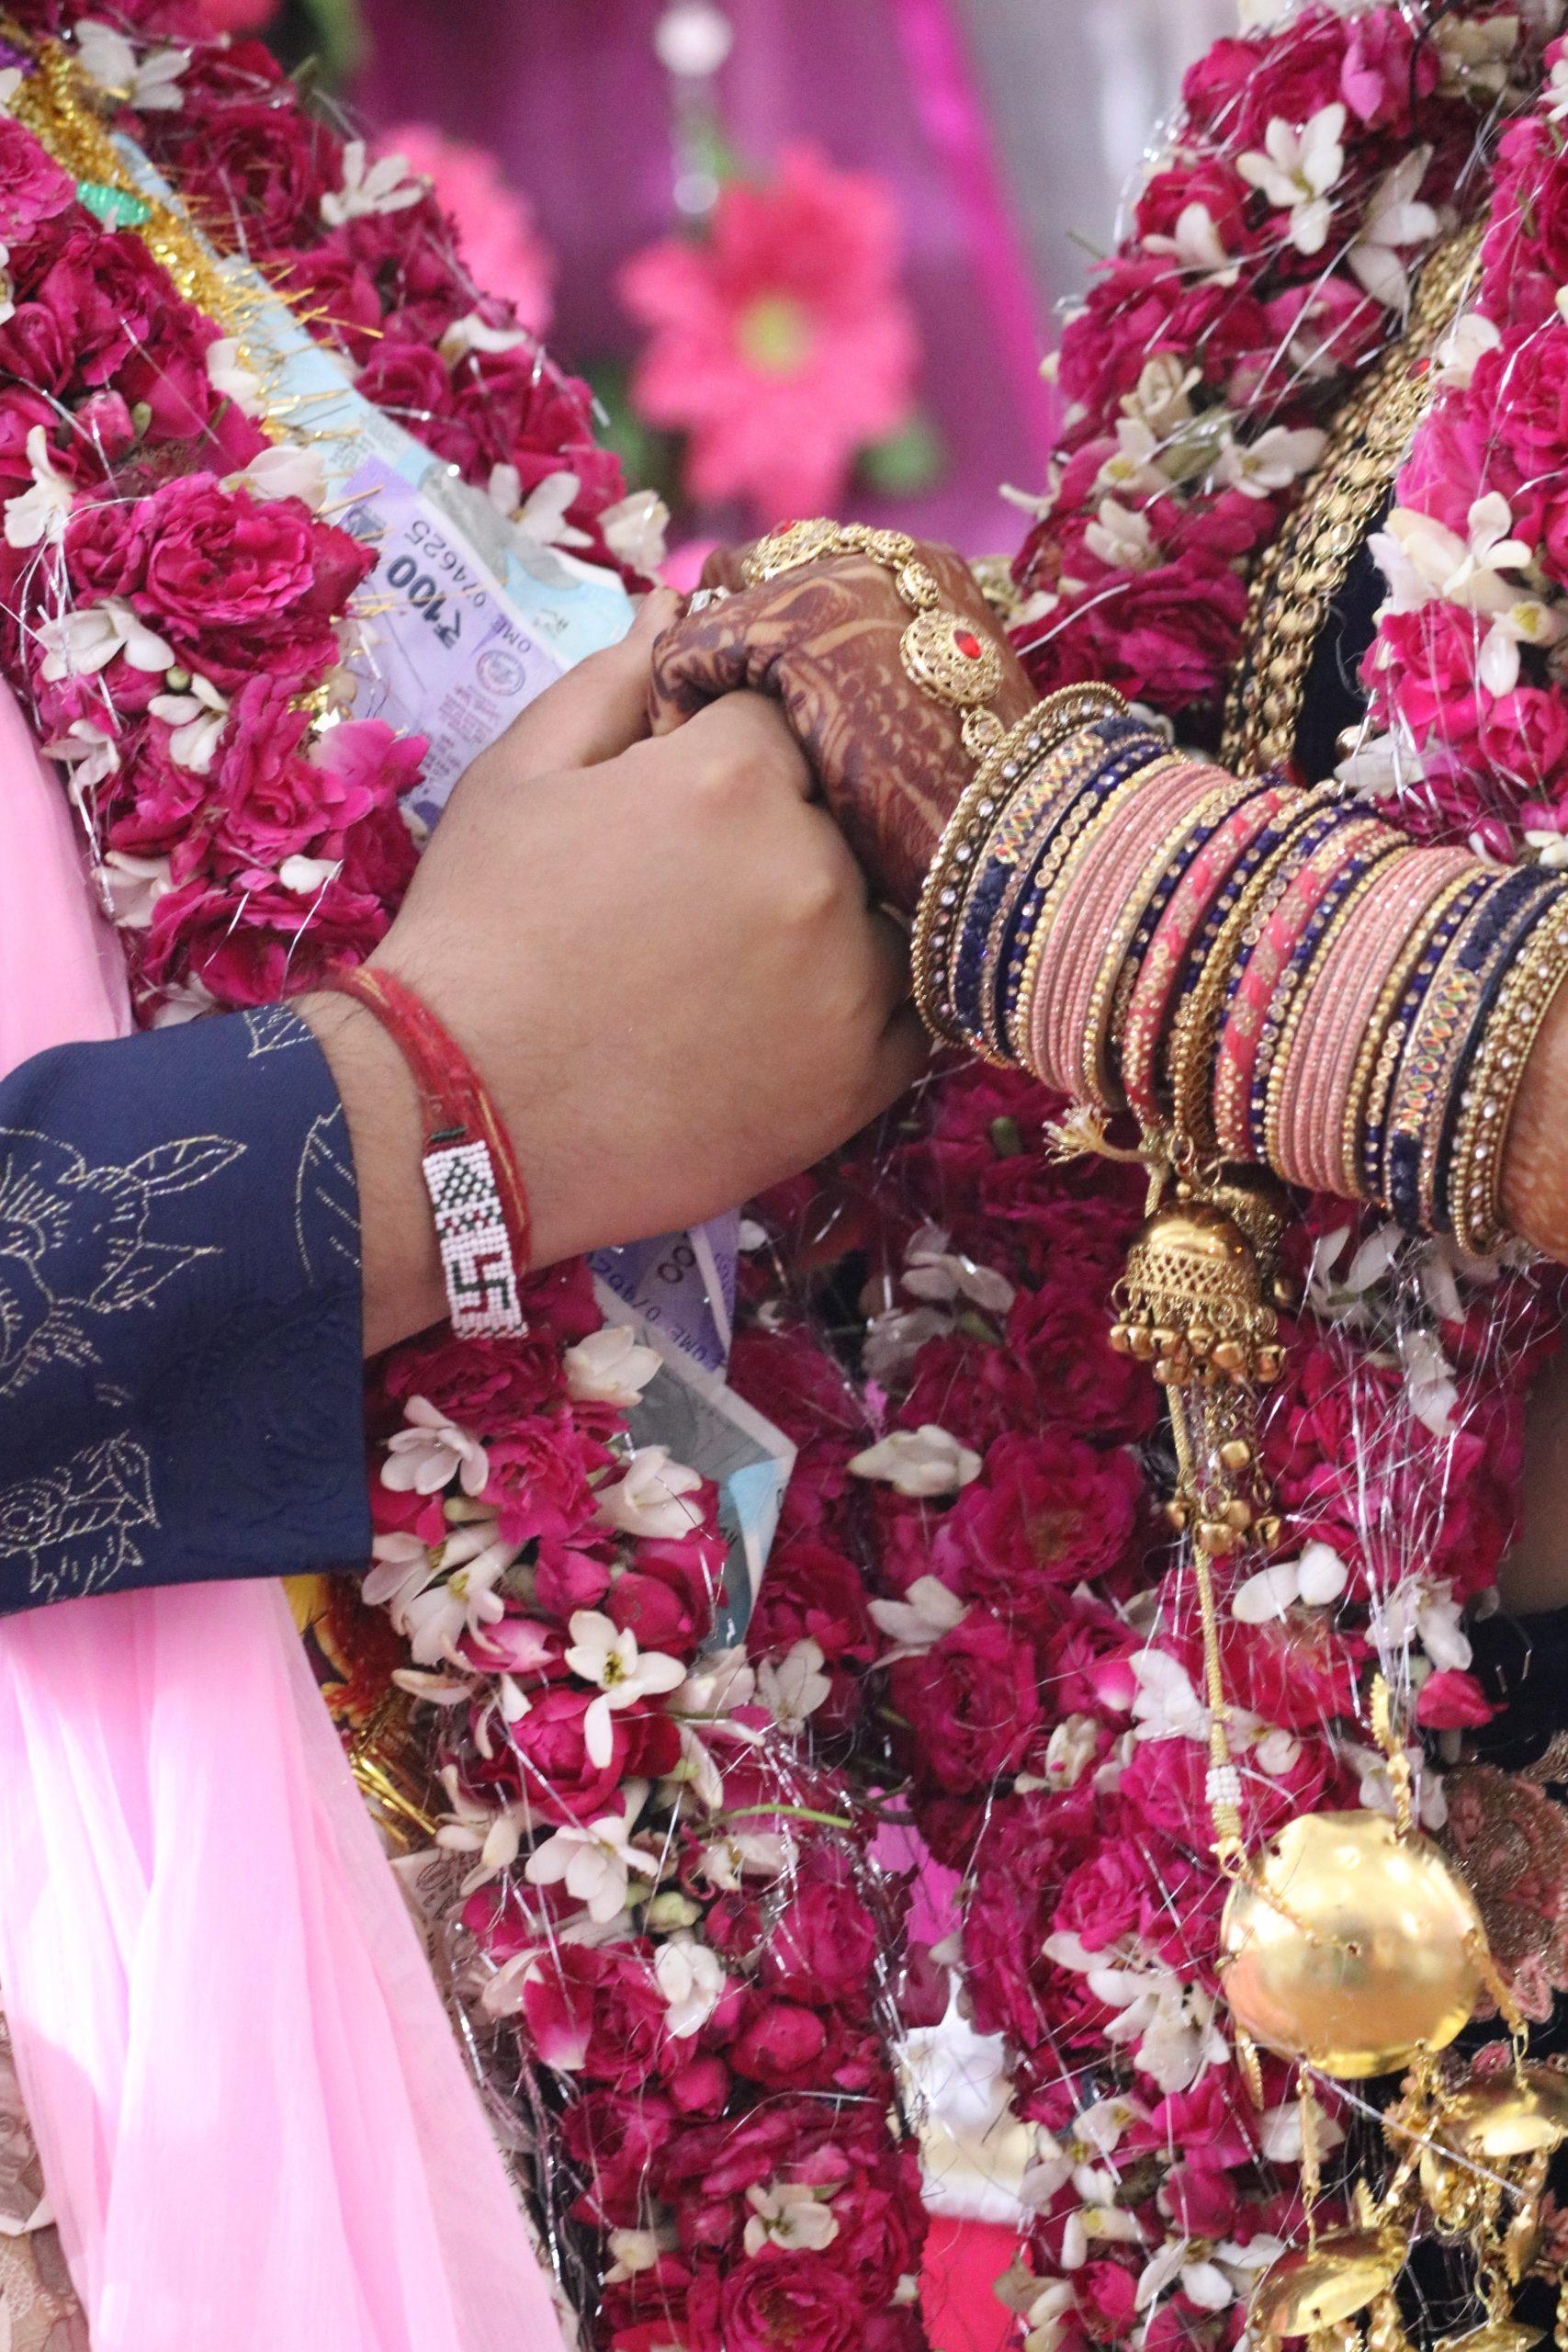 Wedding couple's hands